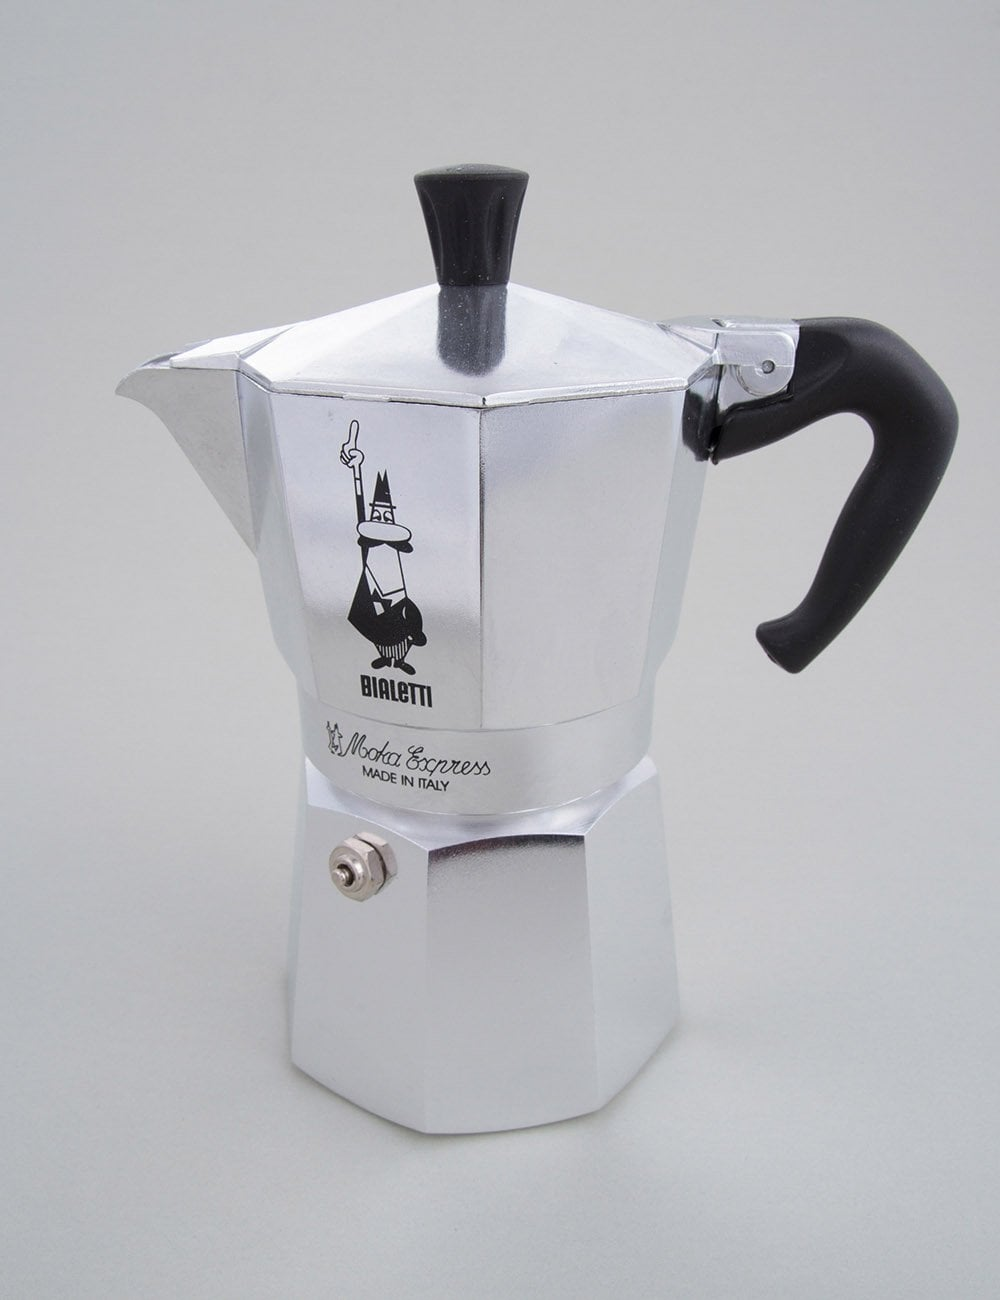 Coffee Maker Moka Express : CarharttxBialetti Moka Express Coffee Maker - Lifestyle from Fat Buddha Store UK